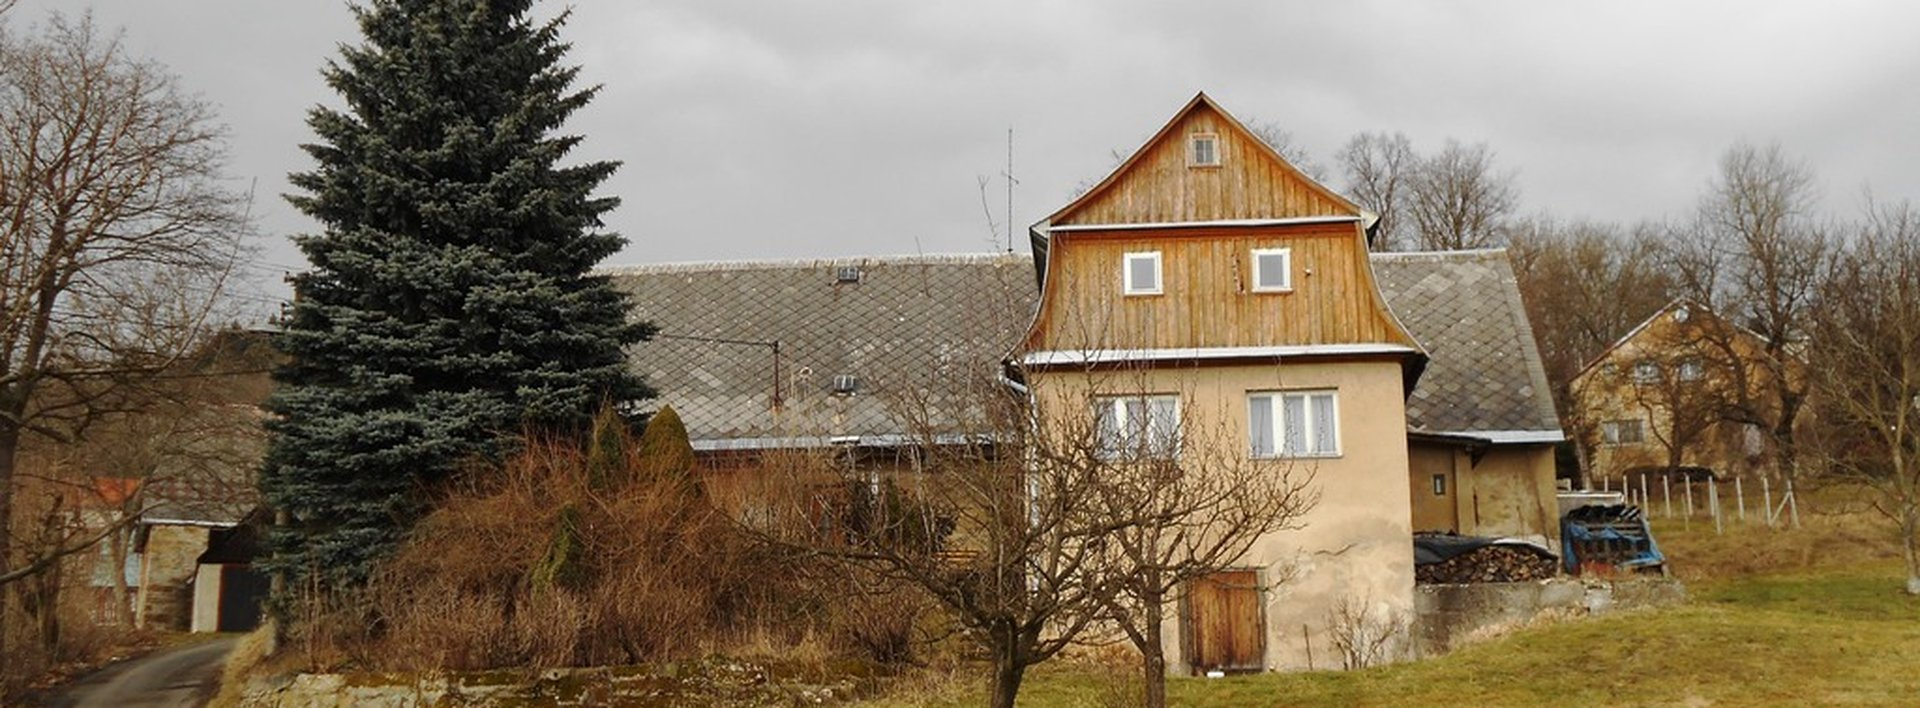 Prodej RD se zahradou v Záskalí - Hodkovice nad Mohelkou, Ev.č.: N47466